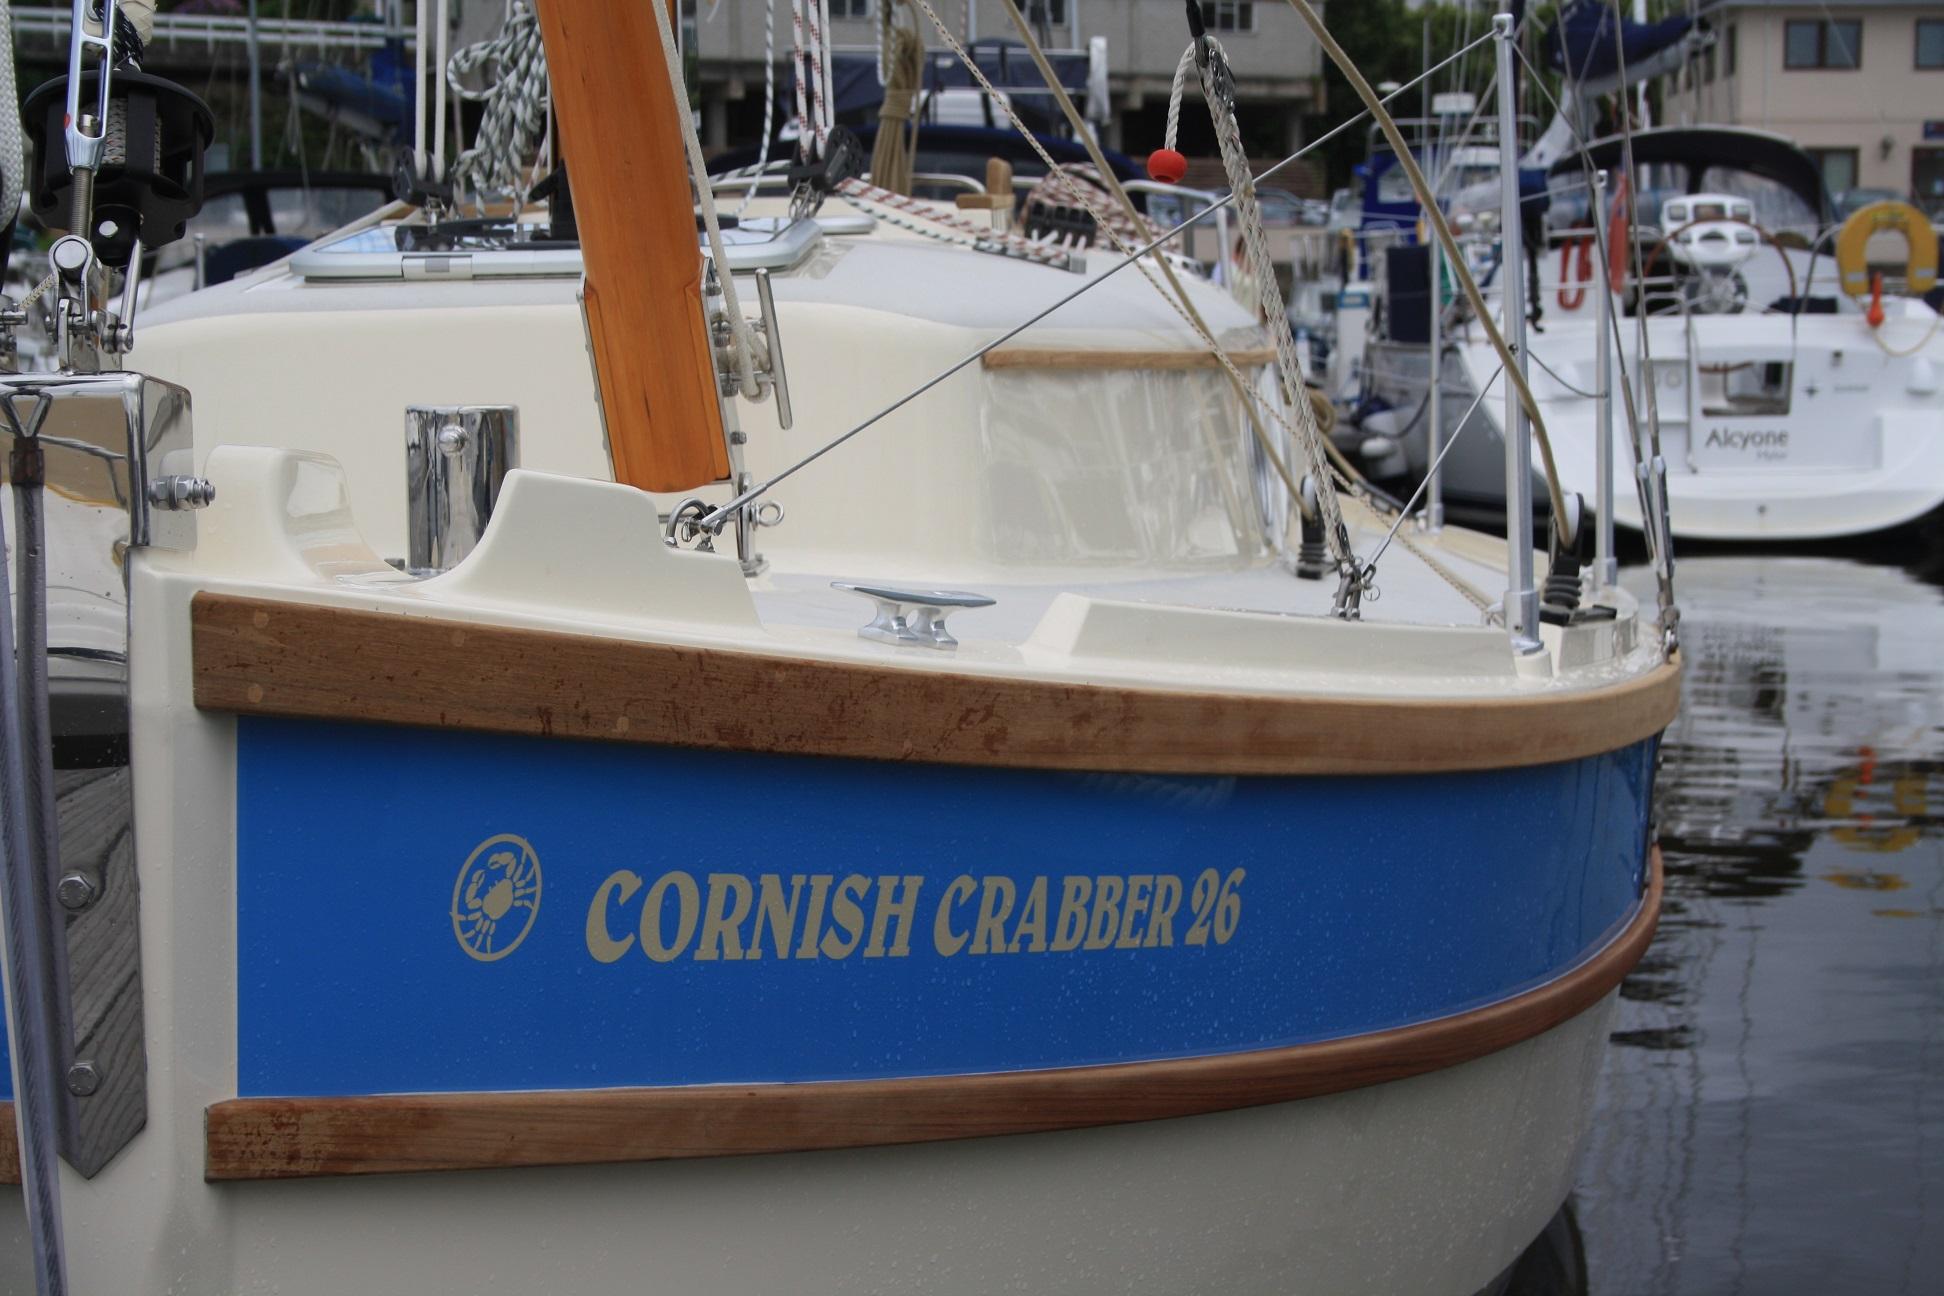 Crabber 26 in marina